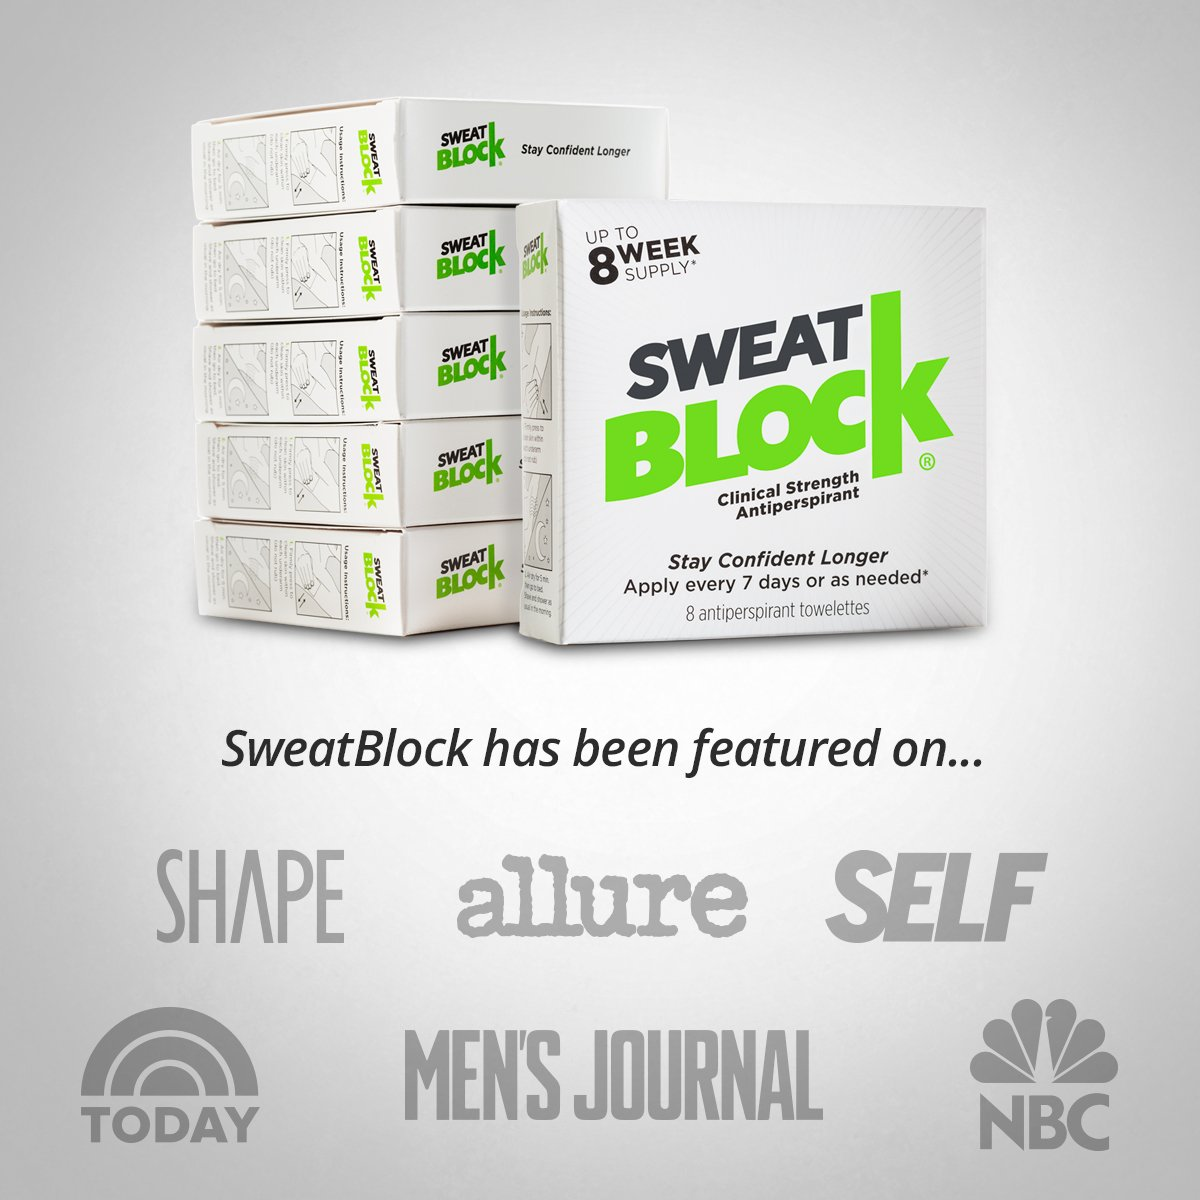 SweatBlock Antiperspirant - Clinical Strength - Reduce Sweat up to 7-days per Use by SweatBlock (Image #4)